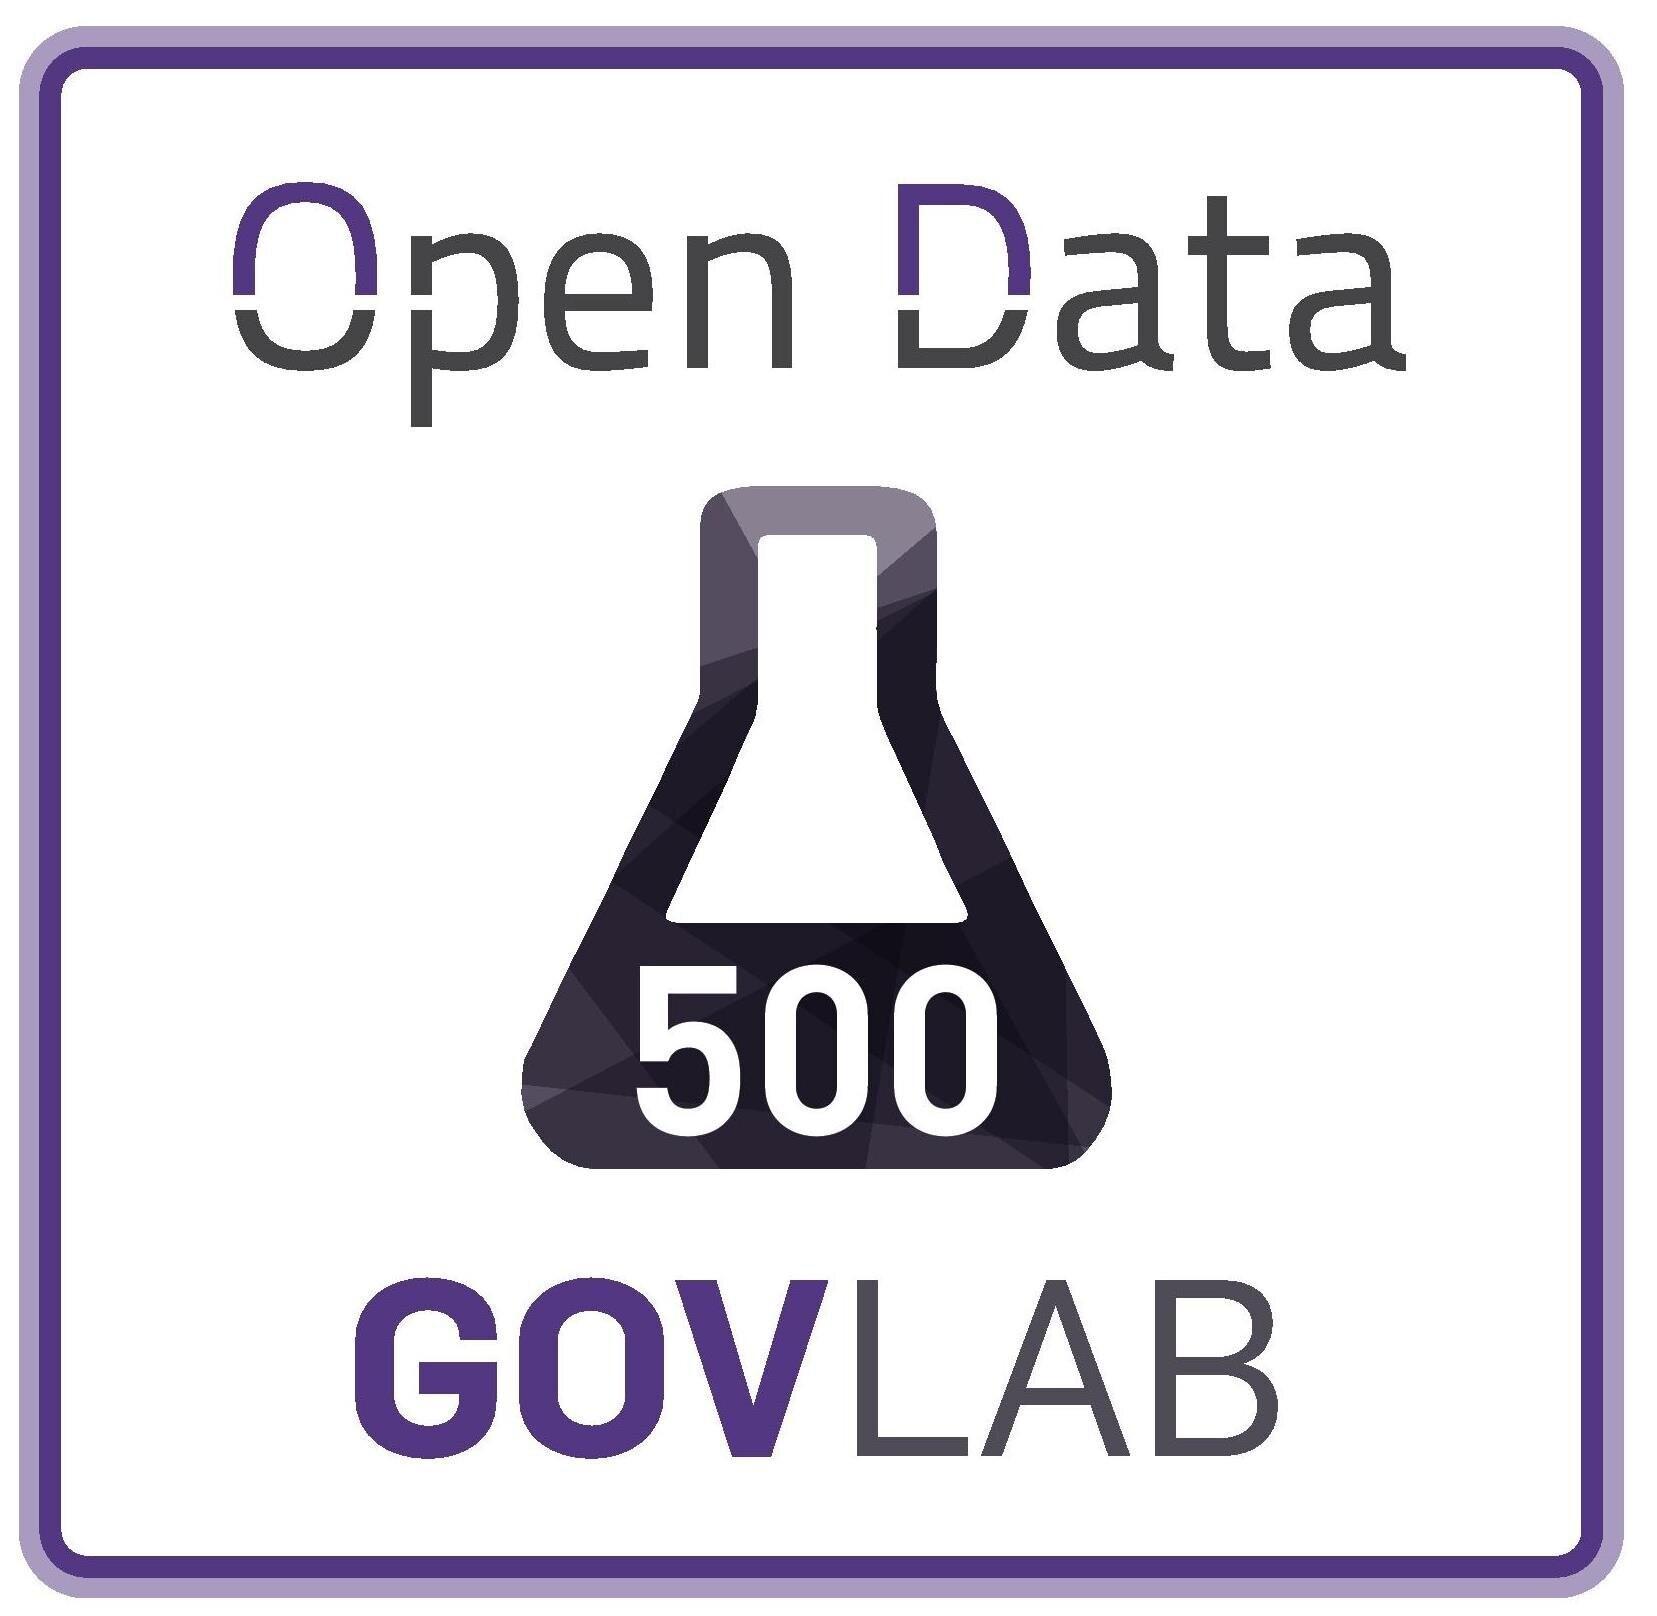 Open Data 500